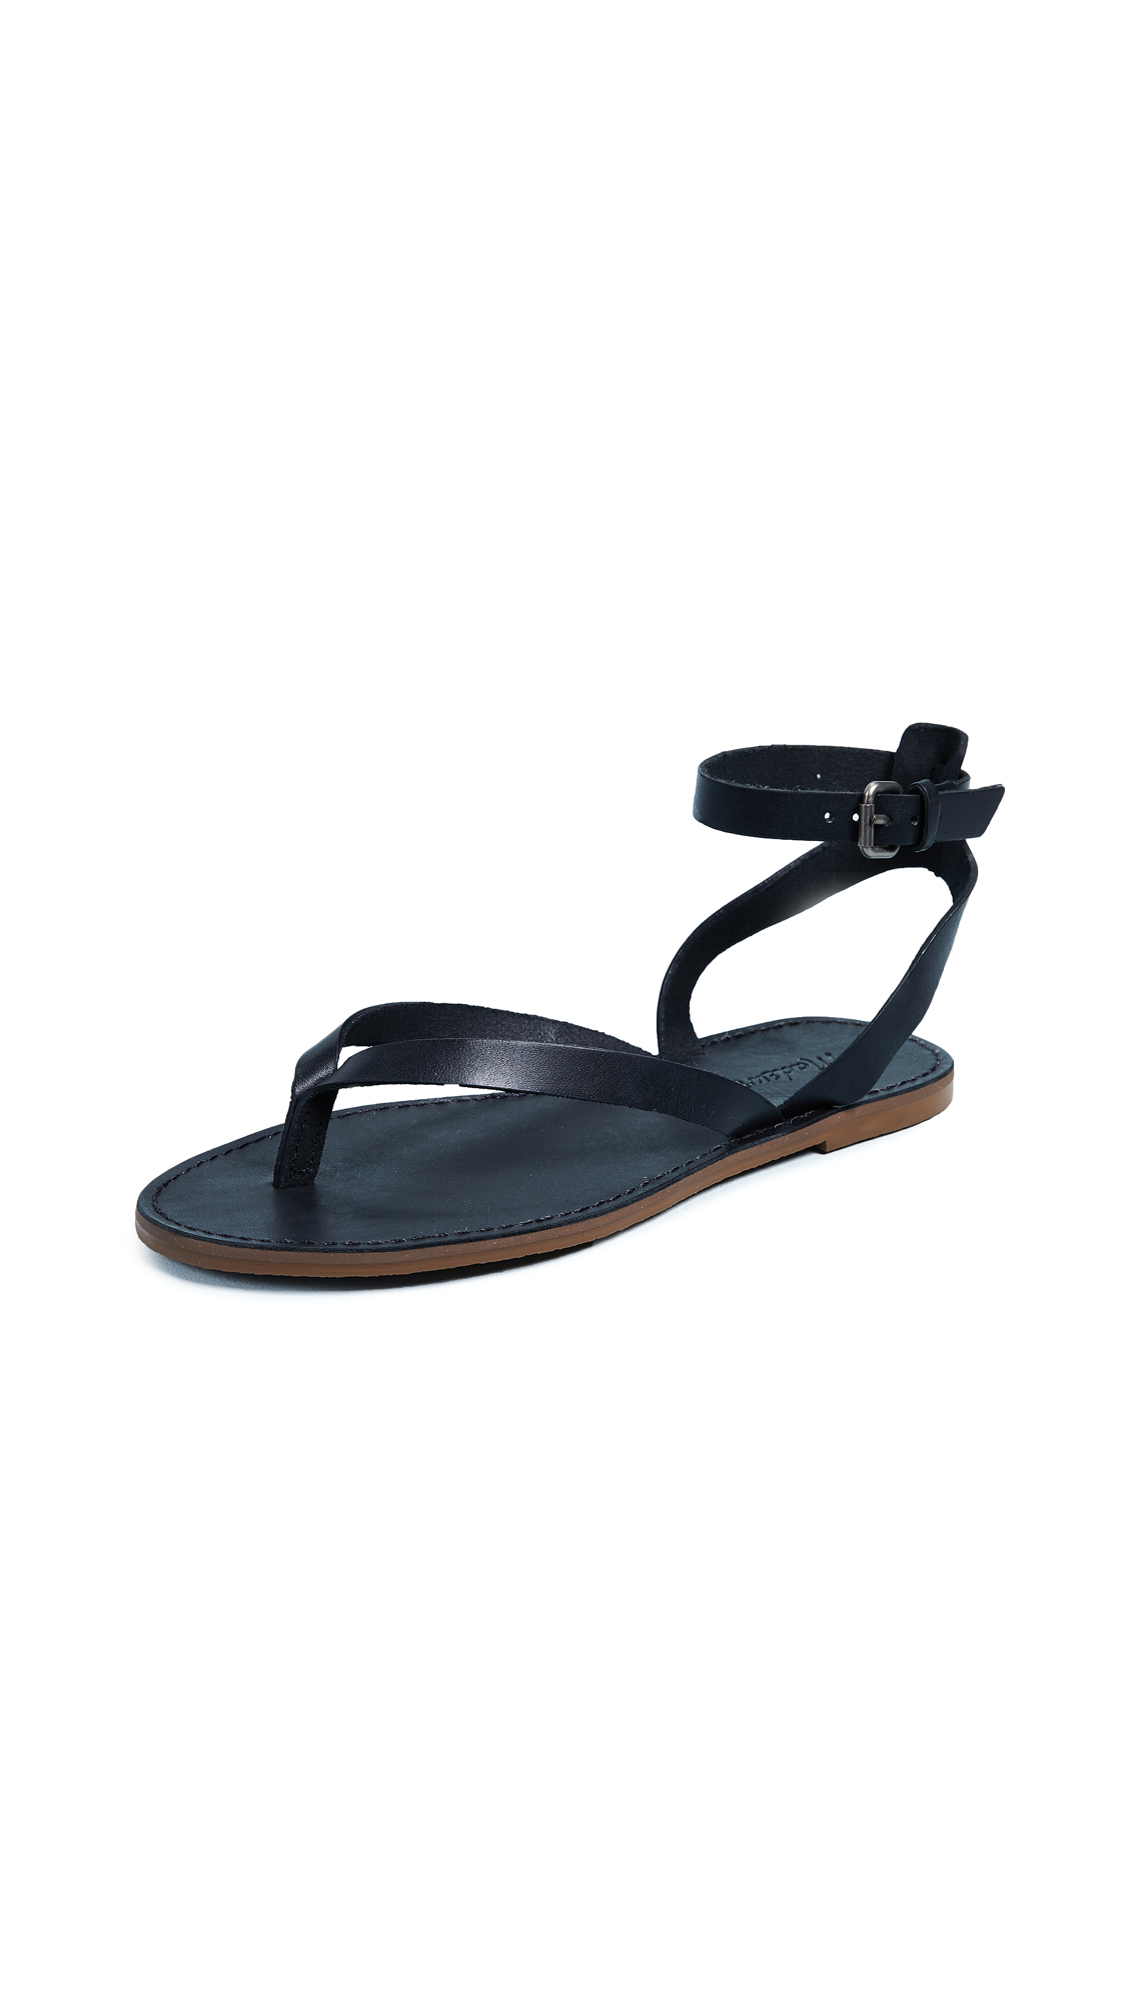 Madewell The Boardwalk Thong Sandals - True Black